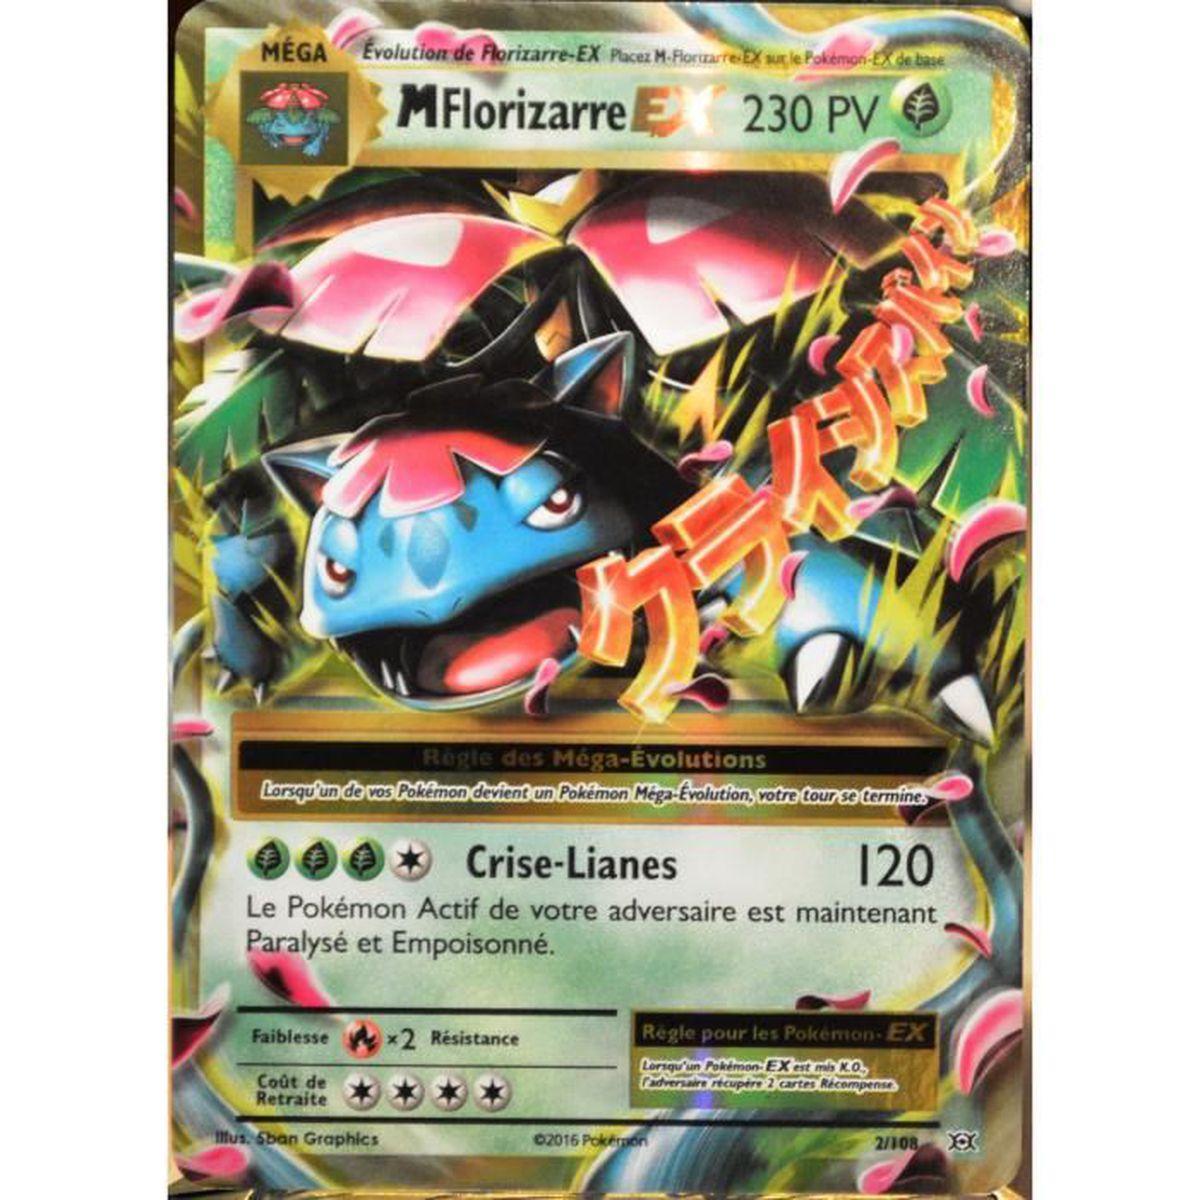 Carte pok mon 2 108 m ga florizarre ex 230 pv xy - Carte pokemon electhor ex ...